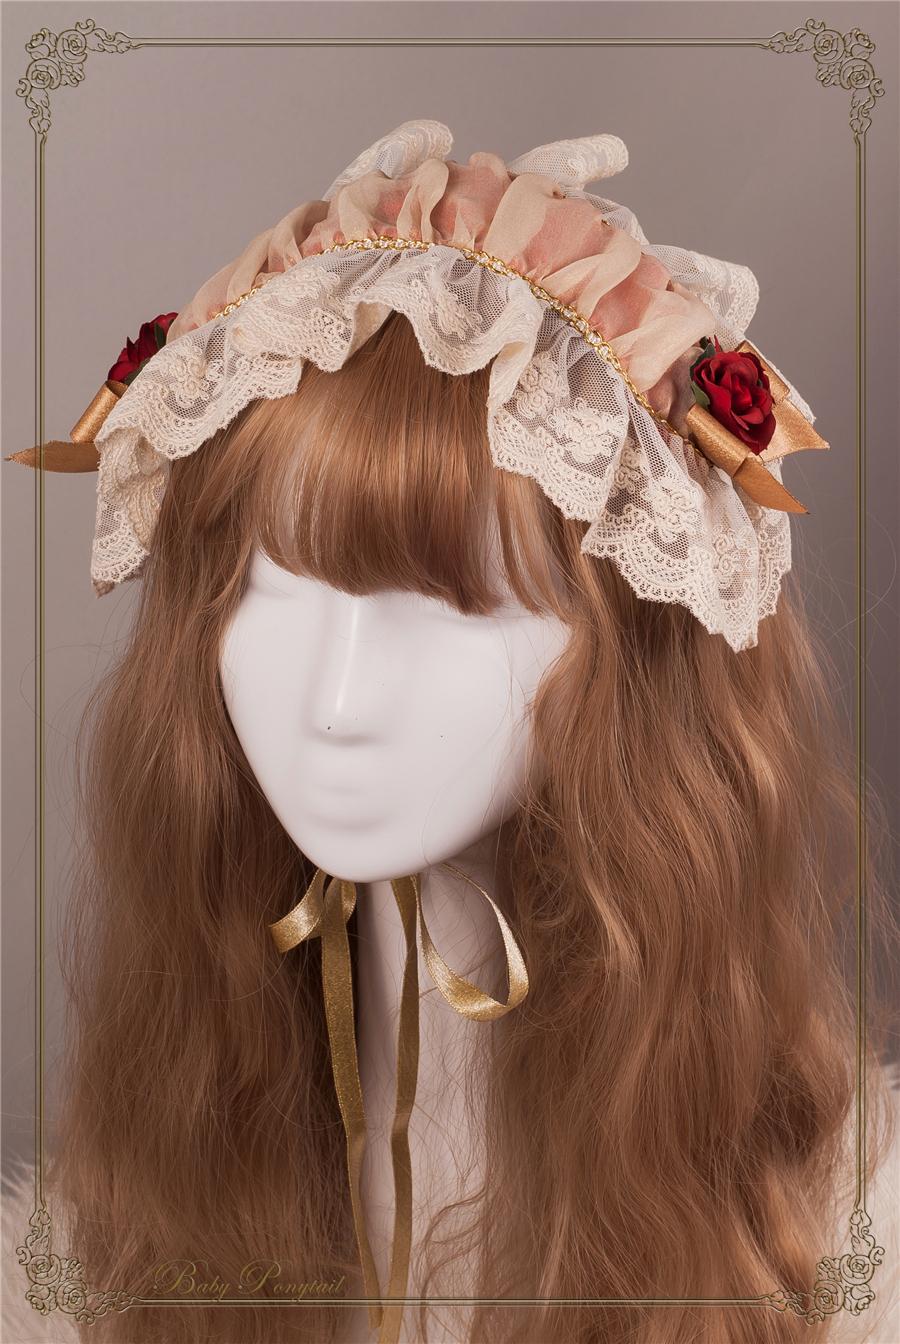 BabyPonytail_Rose Battle_Stock Photo_Petite Rose Head Dress Amber_1.jpg